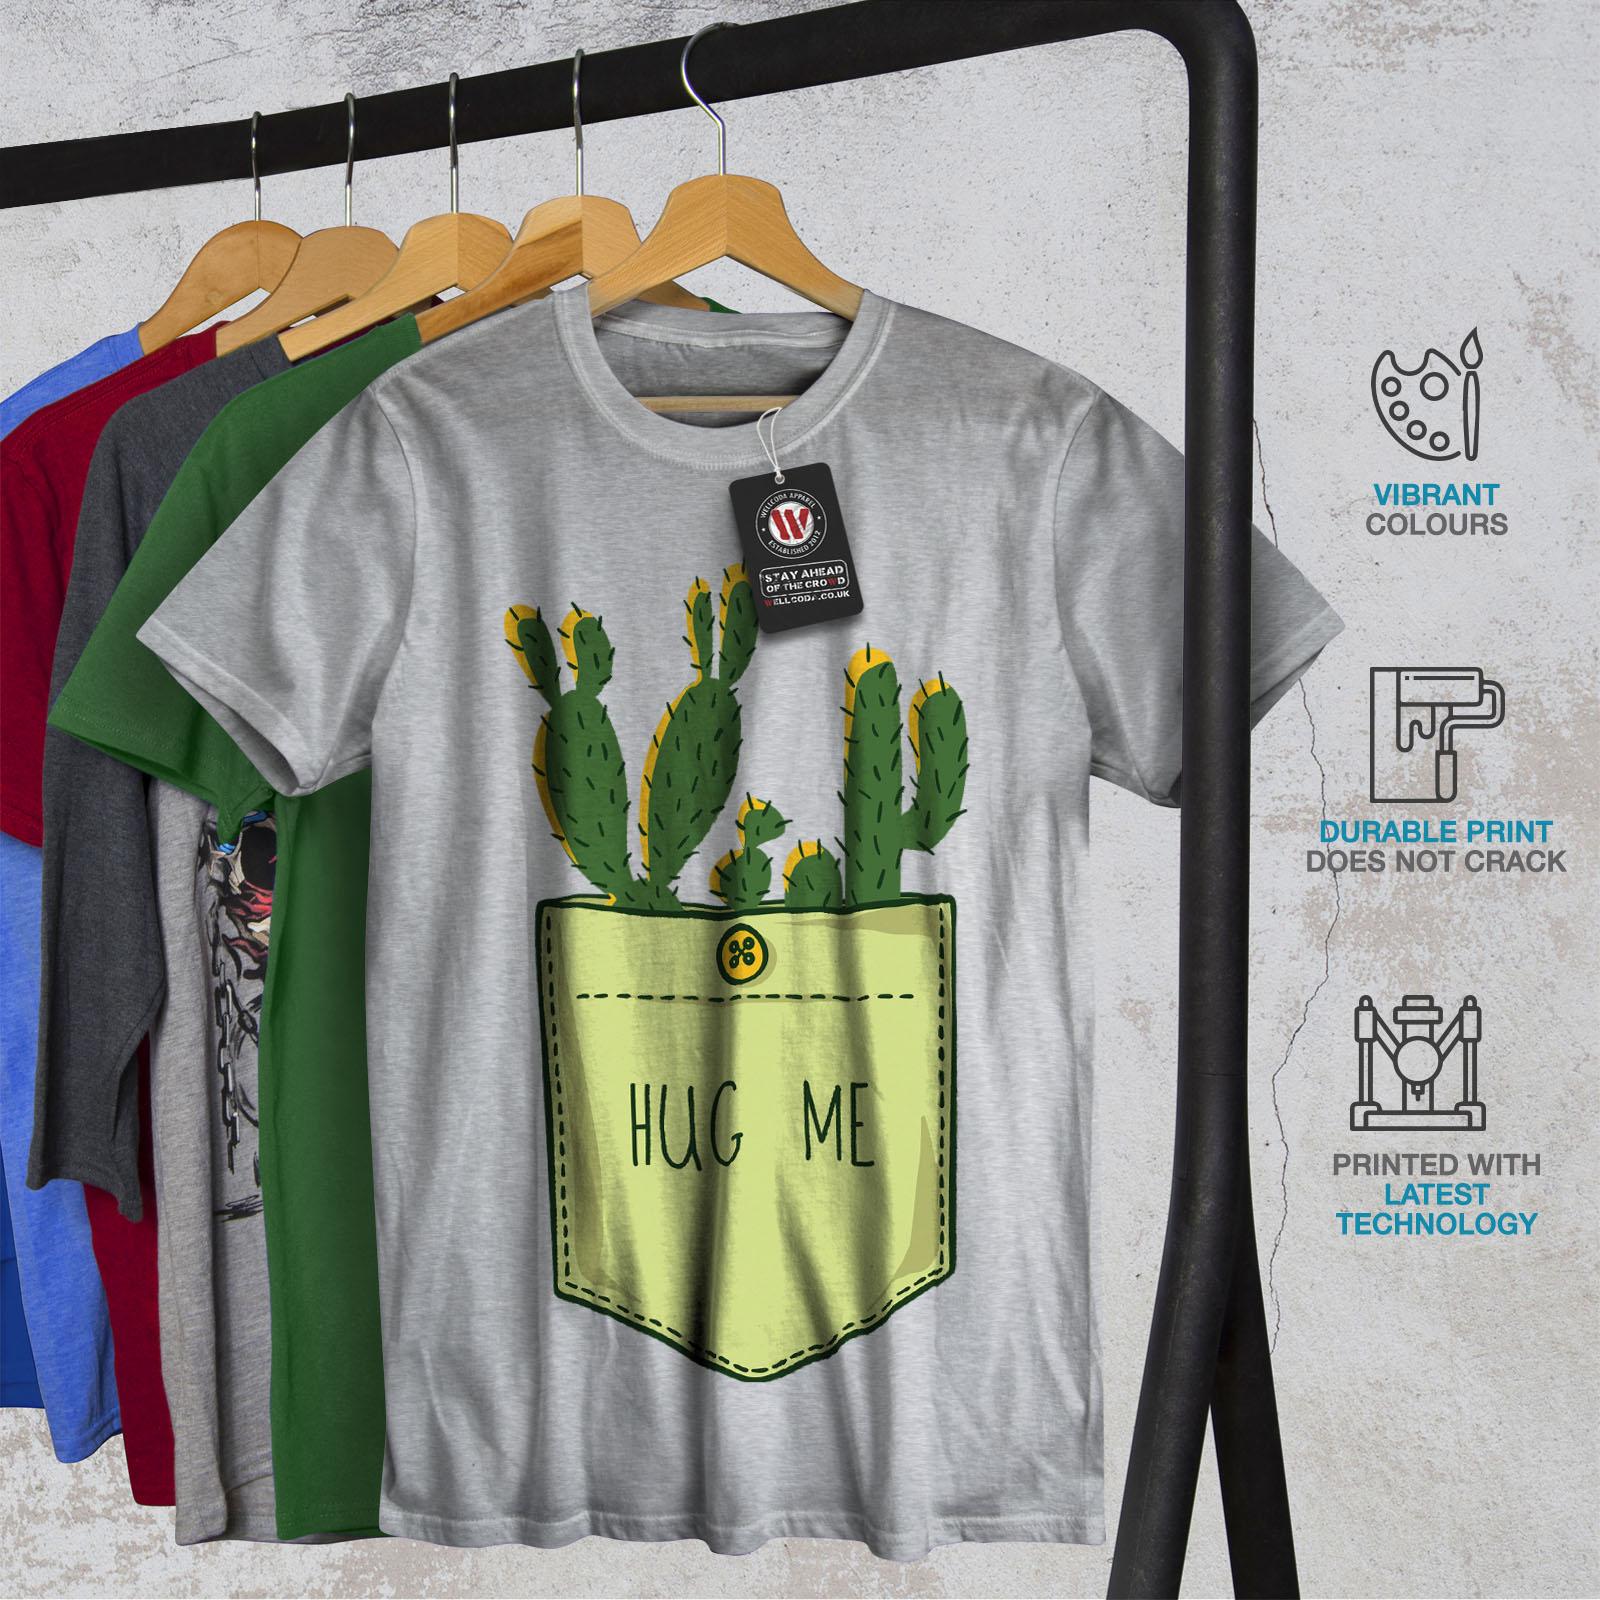 miniature 18 - Wellcoda Hug Me Cactus Funny Mens T-shirt,  Graphic Design Printed Tee